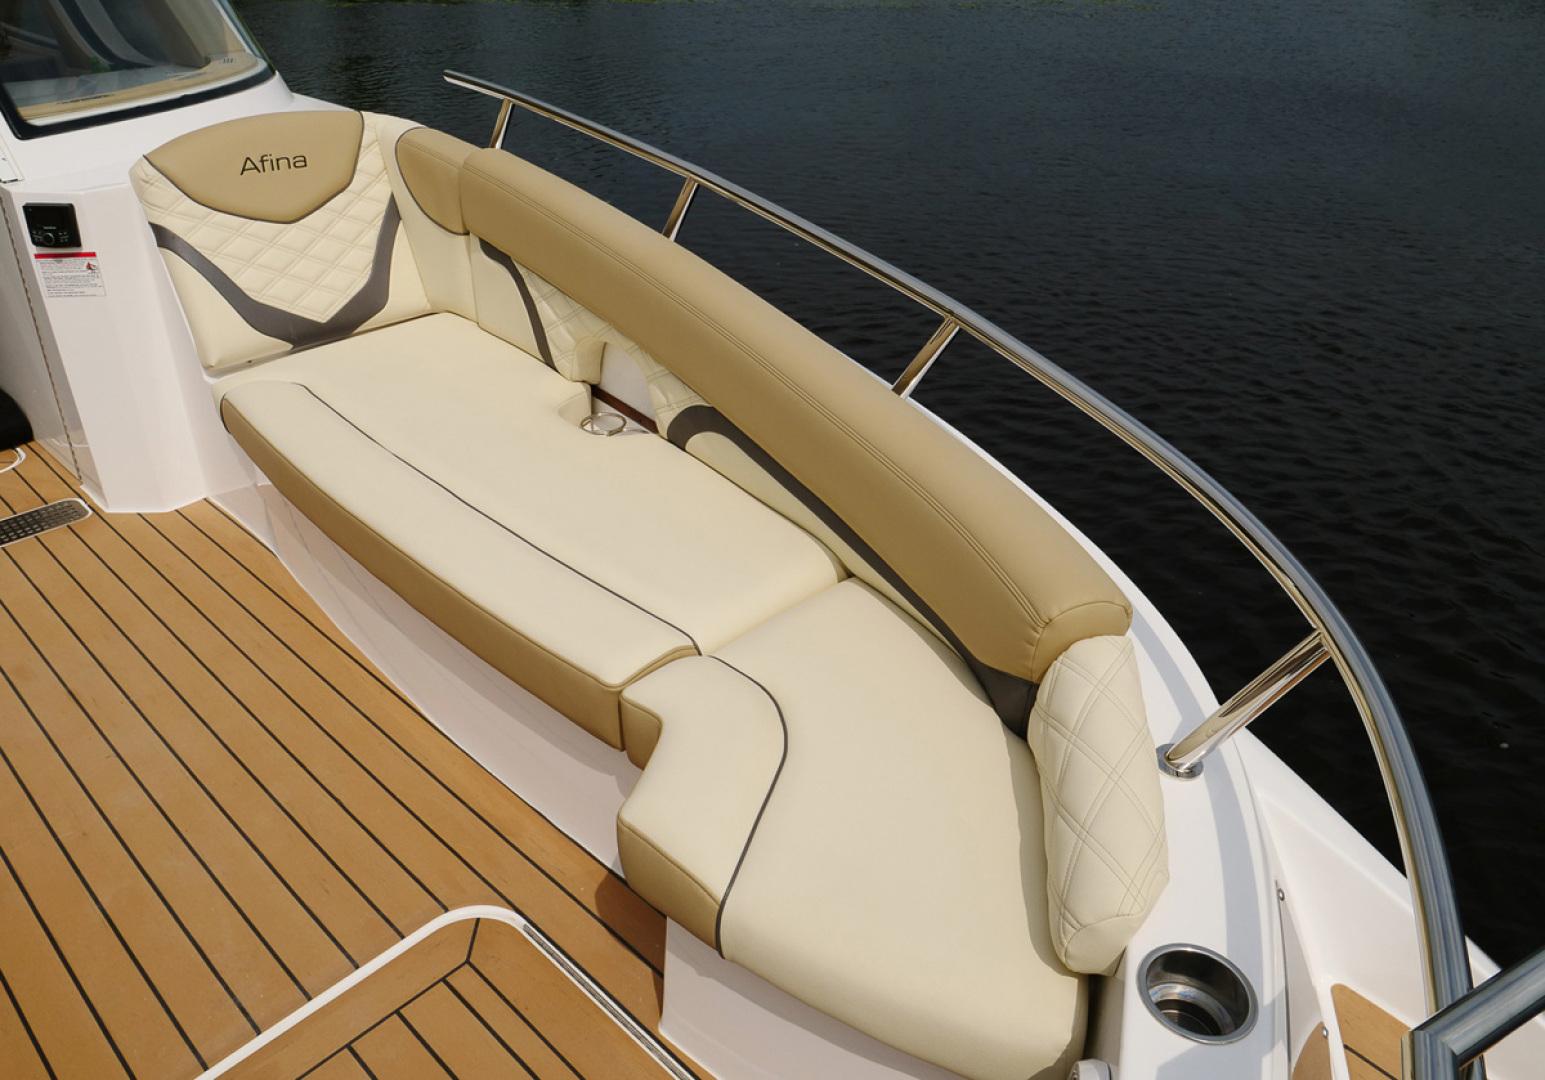 Floe Craft-Afina 3950 2019 -St Petersburg-Florida-United States-1279574   Thumbnail